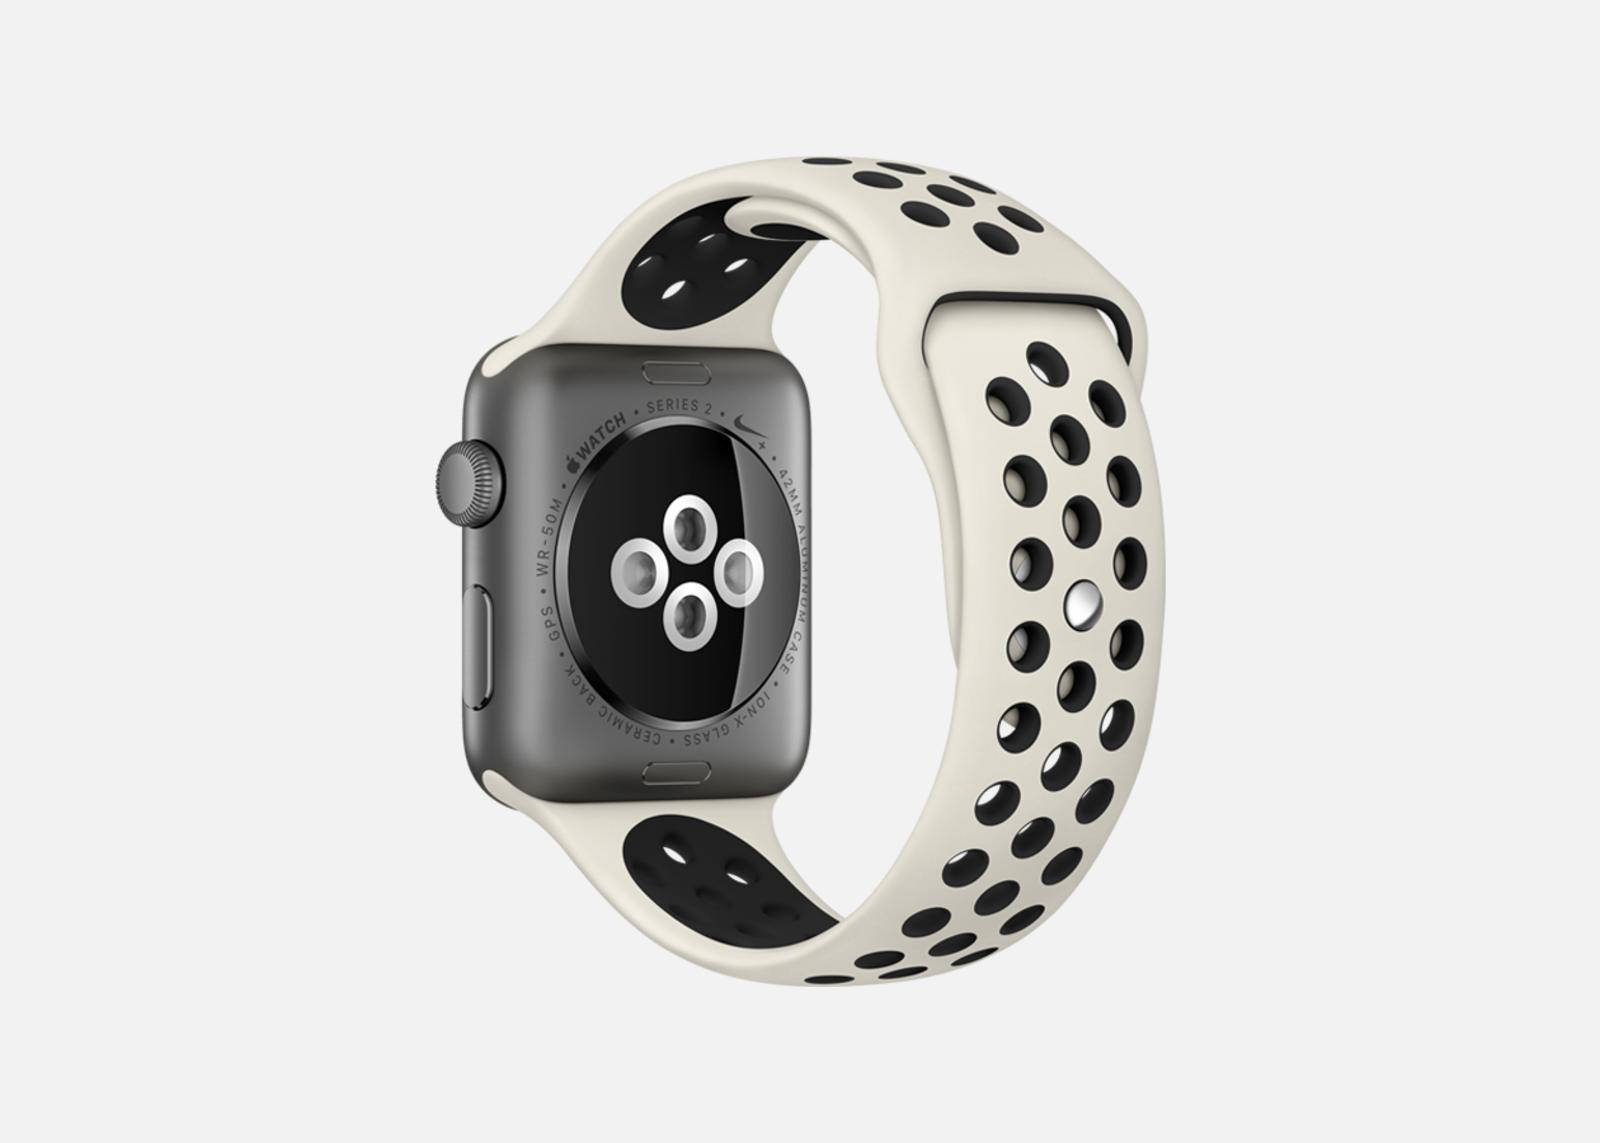 apple_watch_nikelab_3_rectangle_1600.jpg